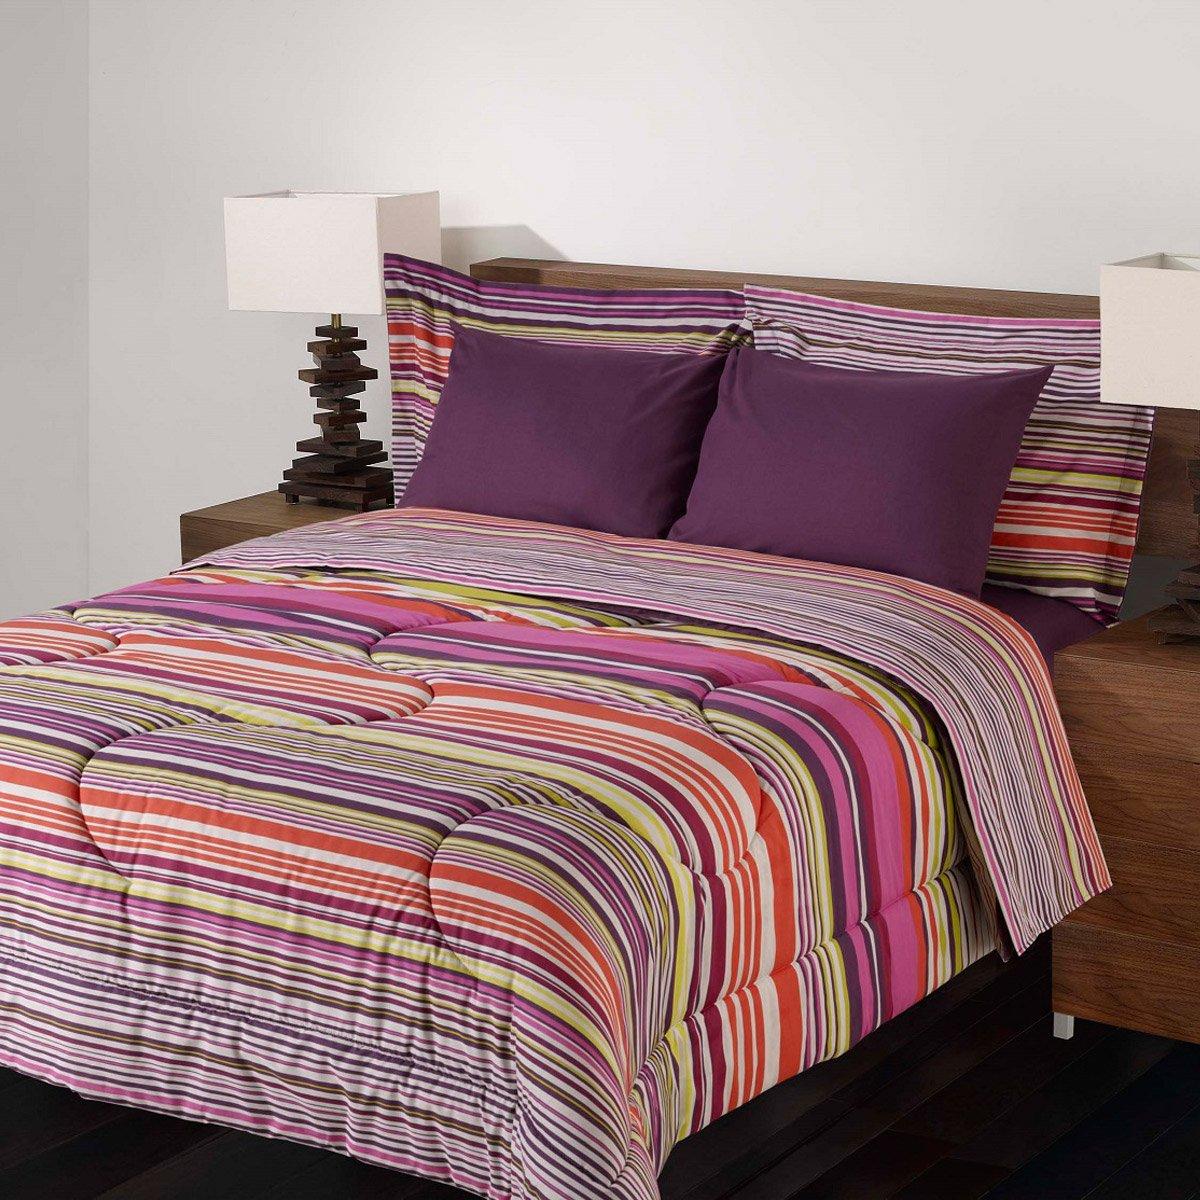 Paquete cama king size touluse sears com mx me entiende for Sabanas para cama king size precios